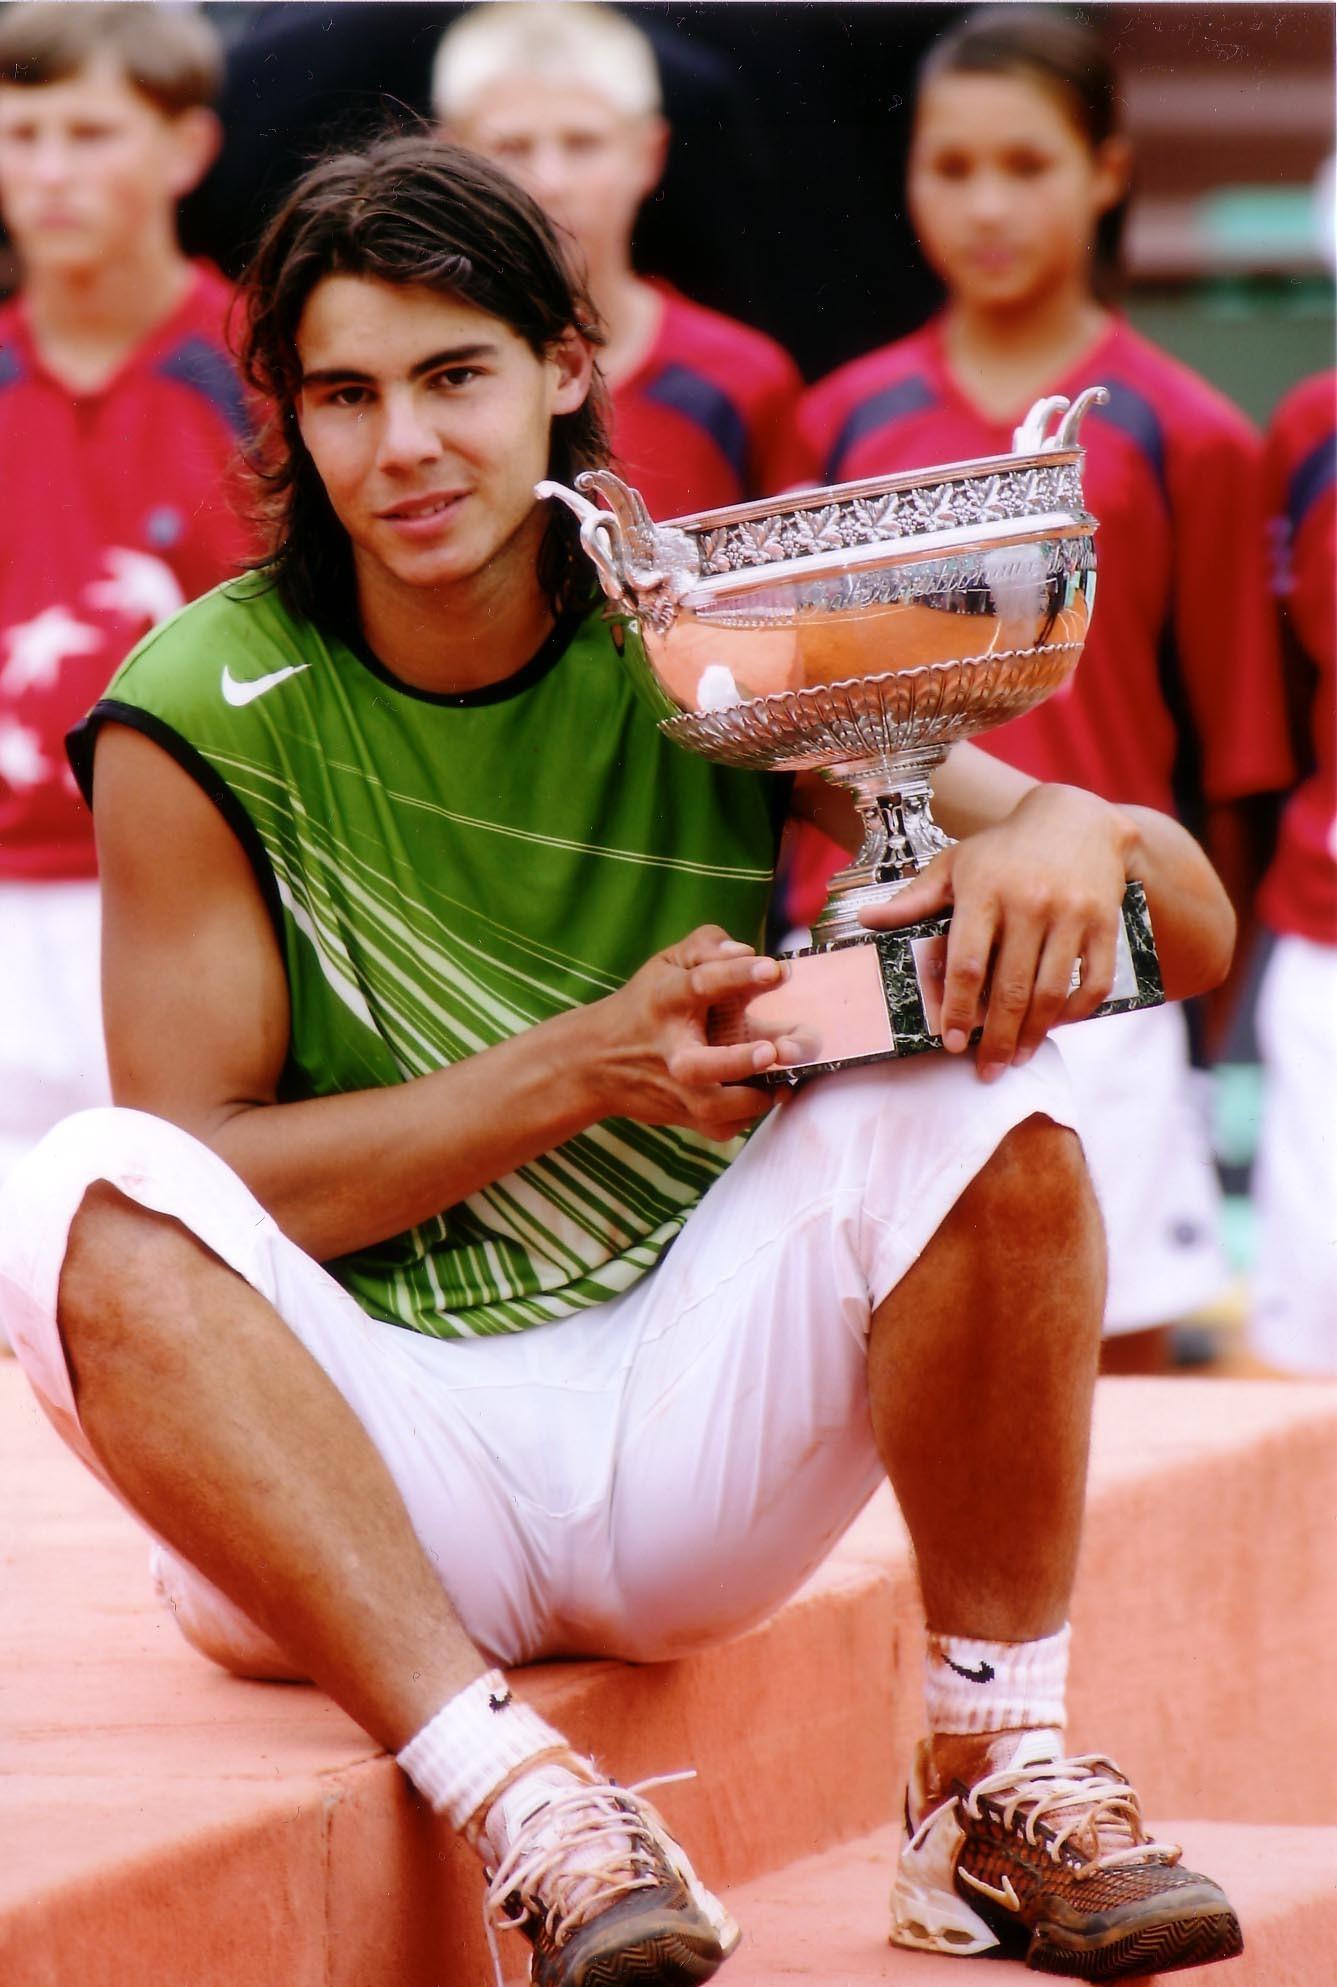 Crotch : Rafael Nadal Crotch - Sex Porn Images